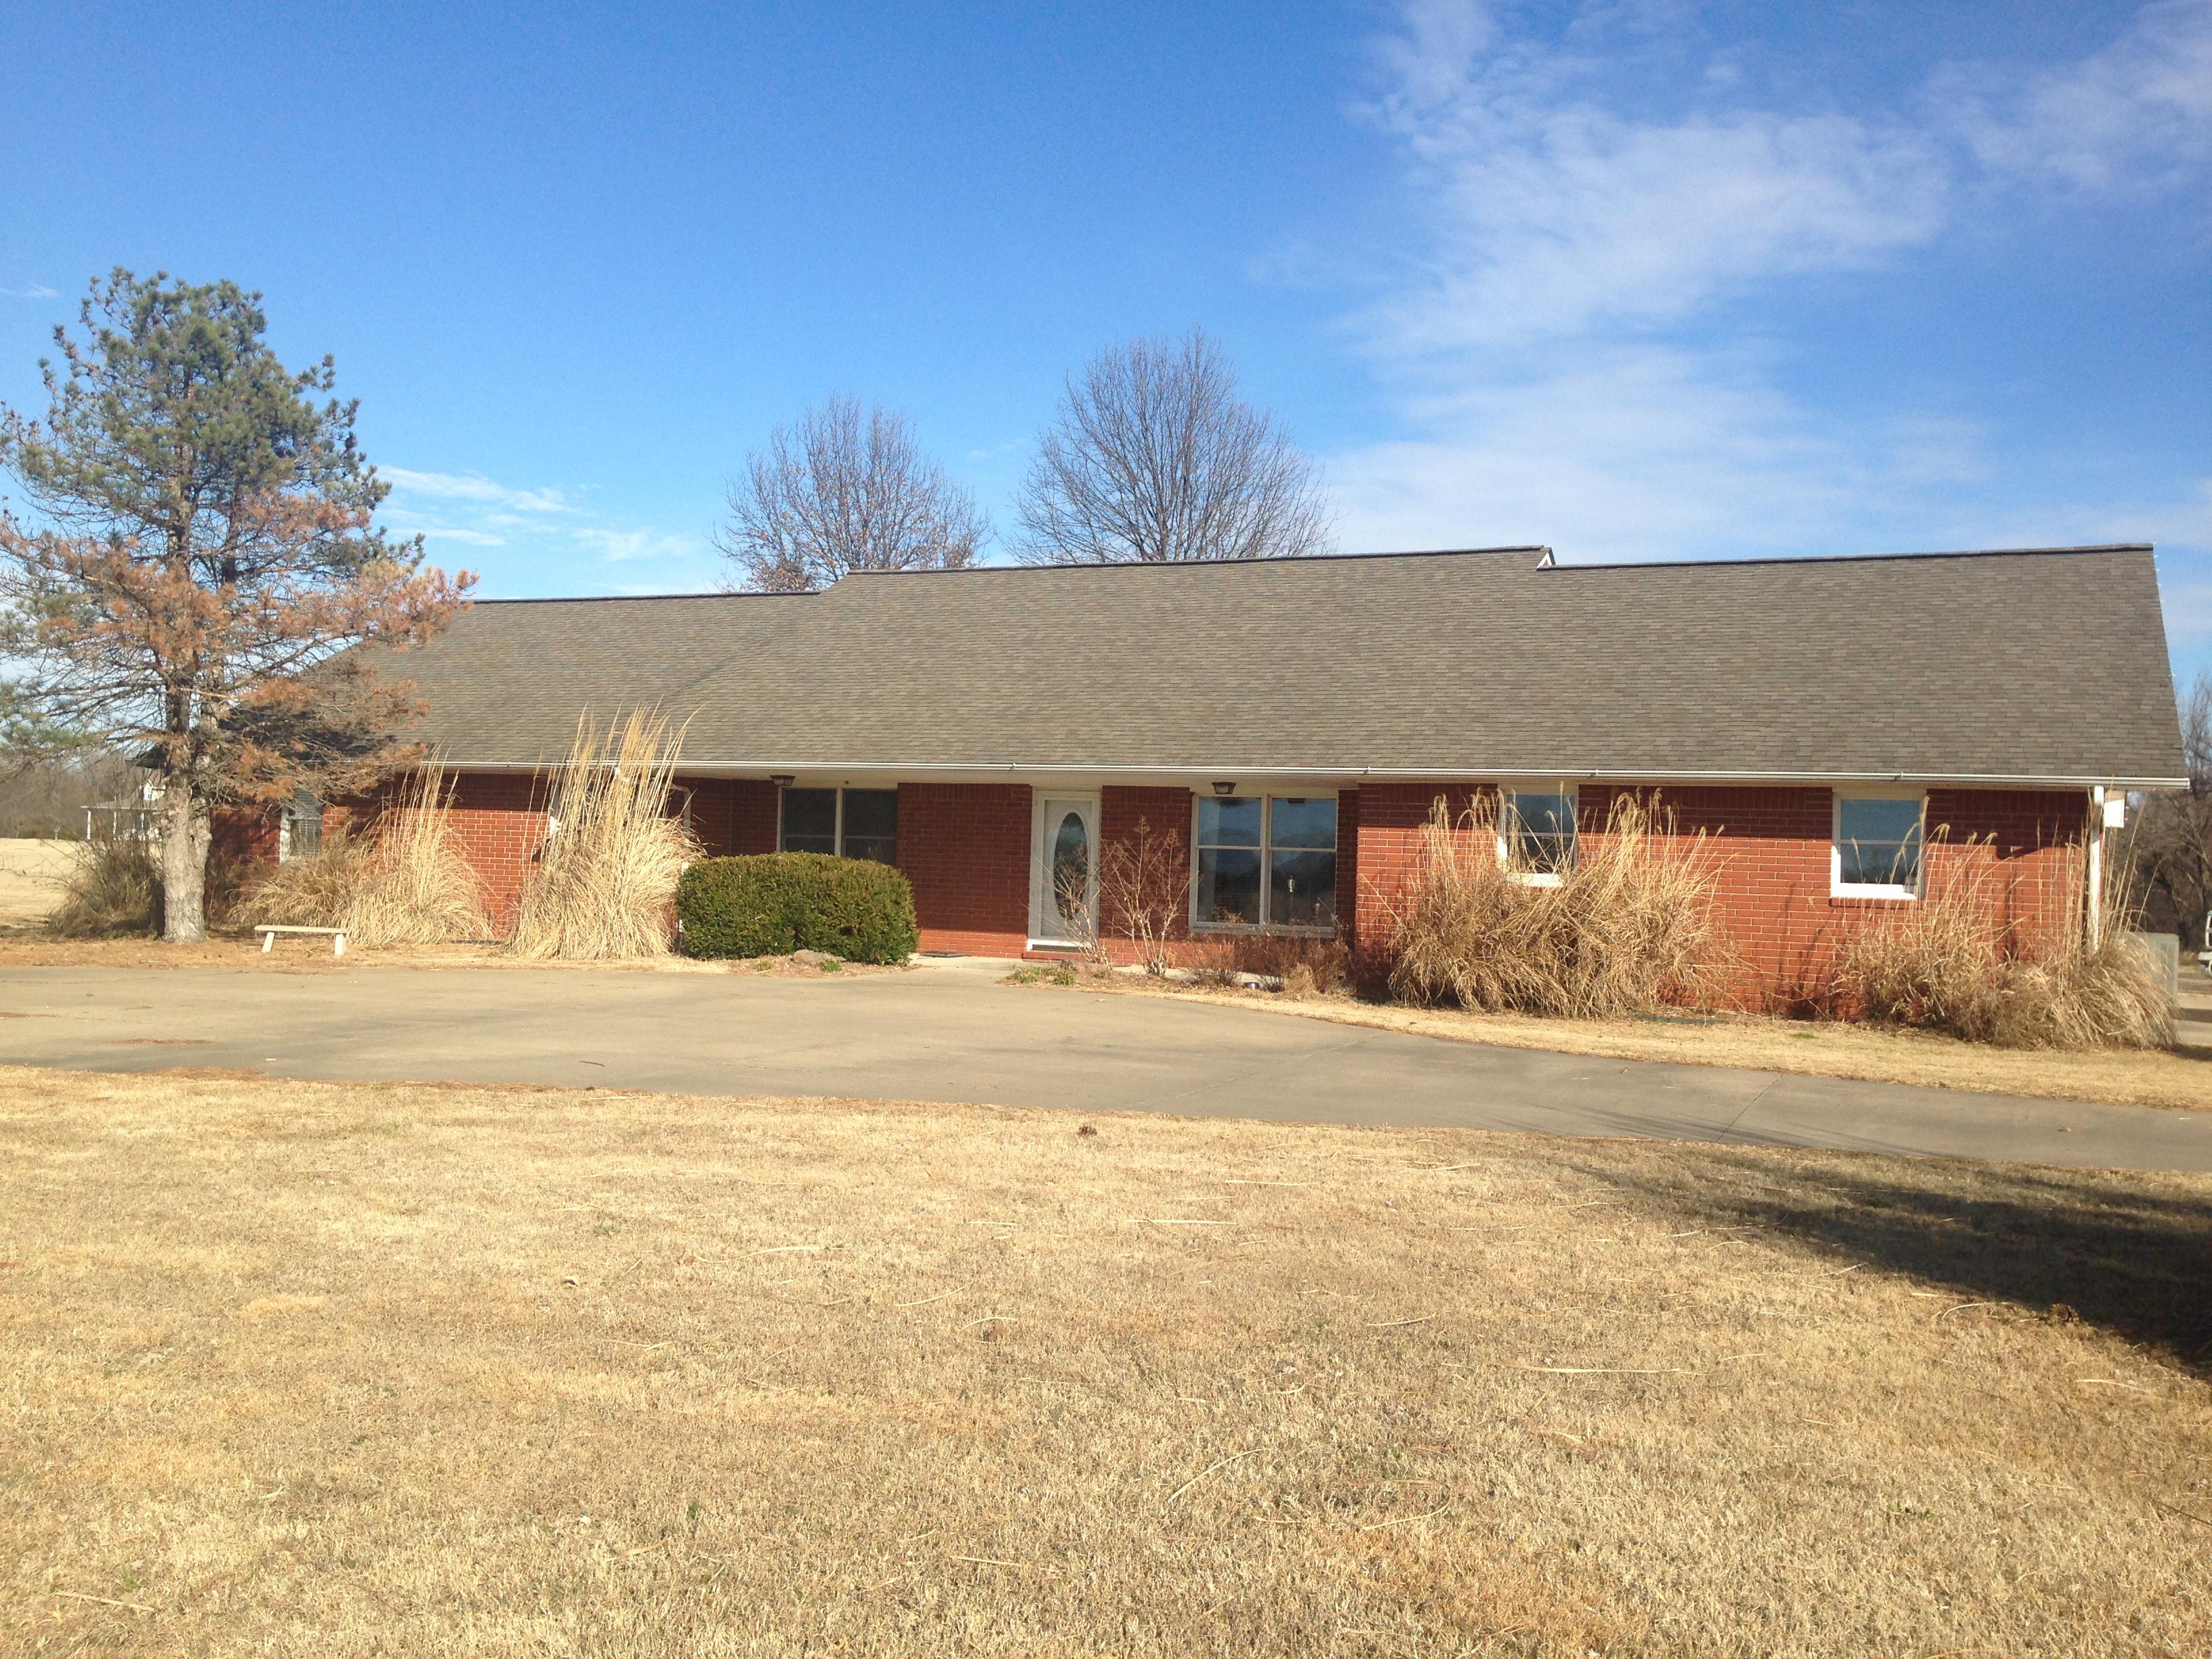 3600 N Main St, Muskogee, Oklahoma 74401